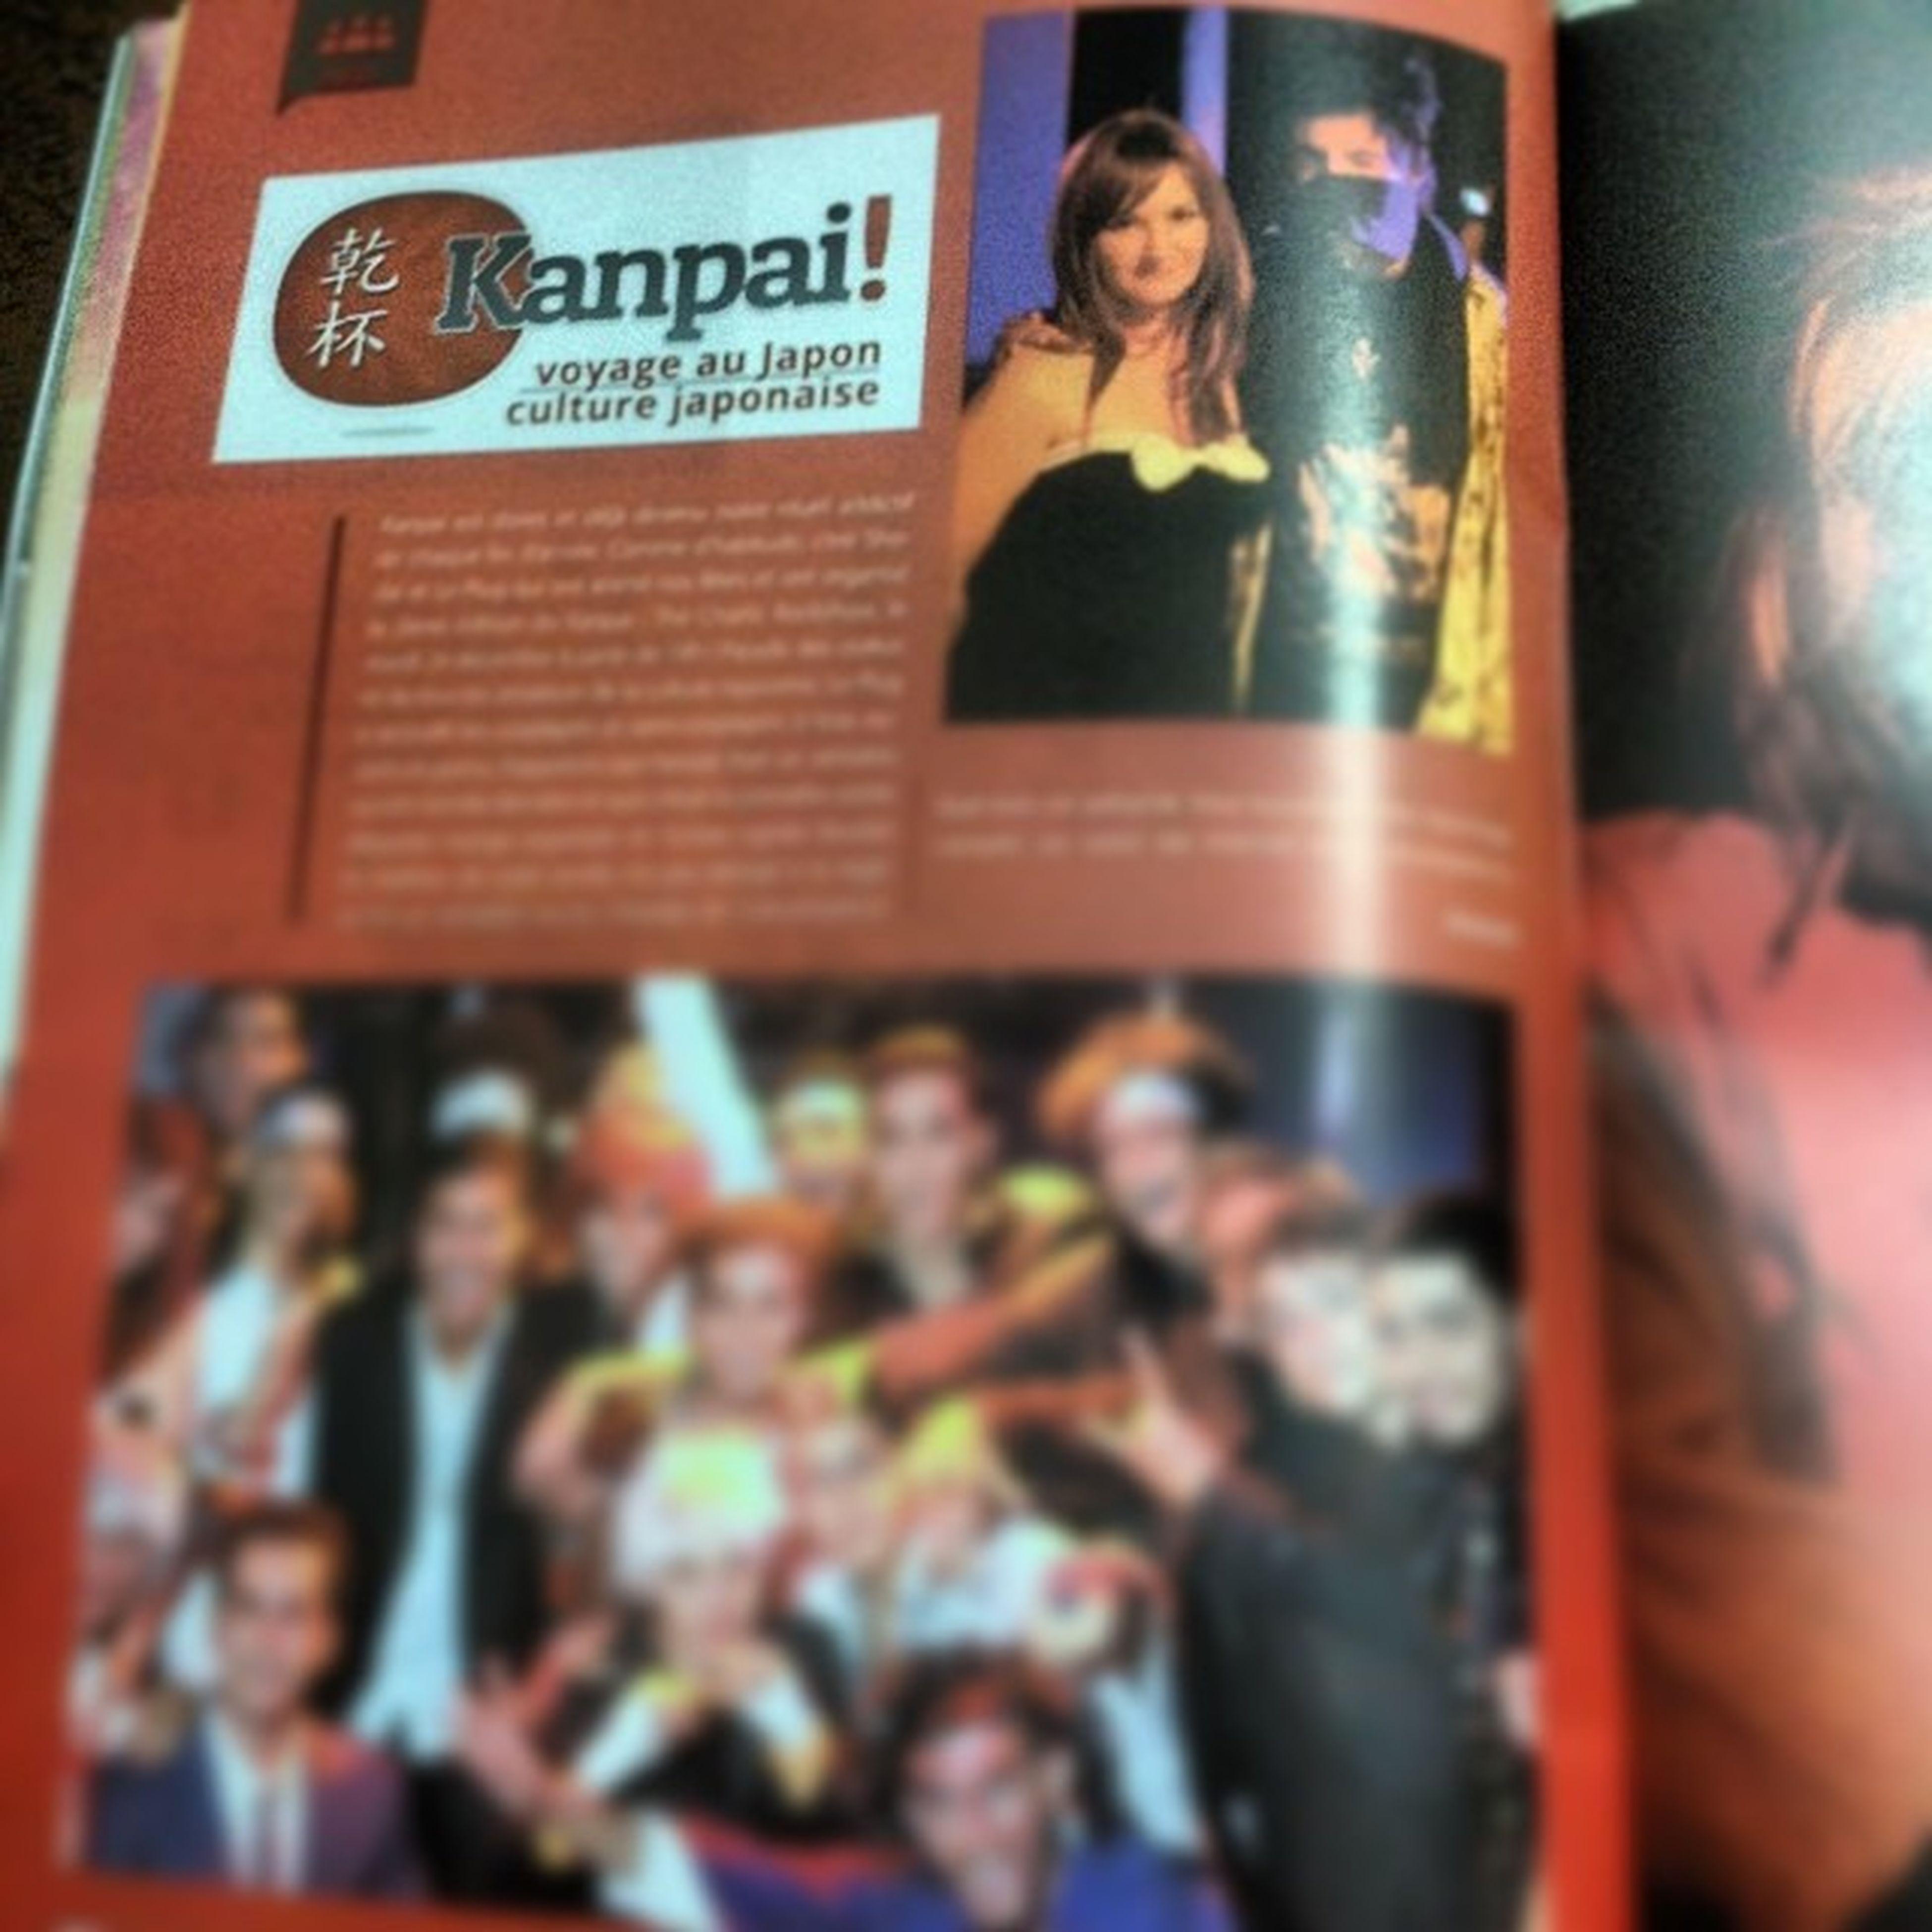 @culturegeektn Article sur le Kanpai2013 Cosplay Culturegeektn